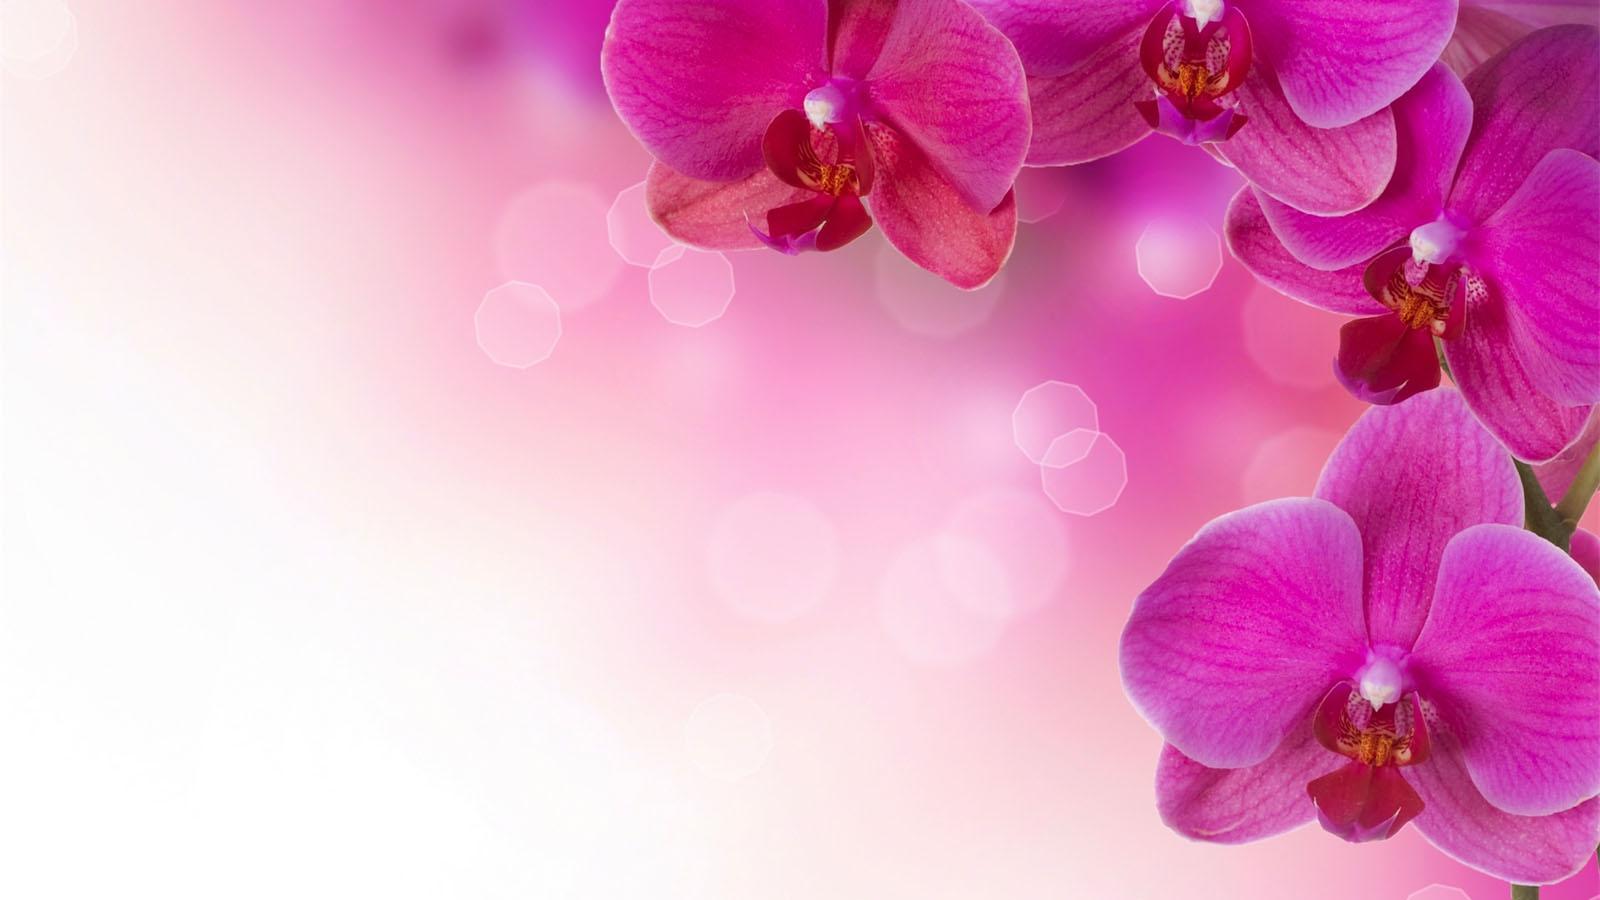 30 Stunning Pink Wallpaper Backgrounds 1600x900